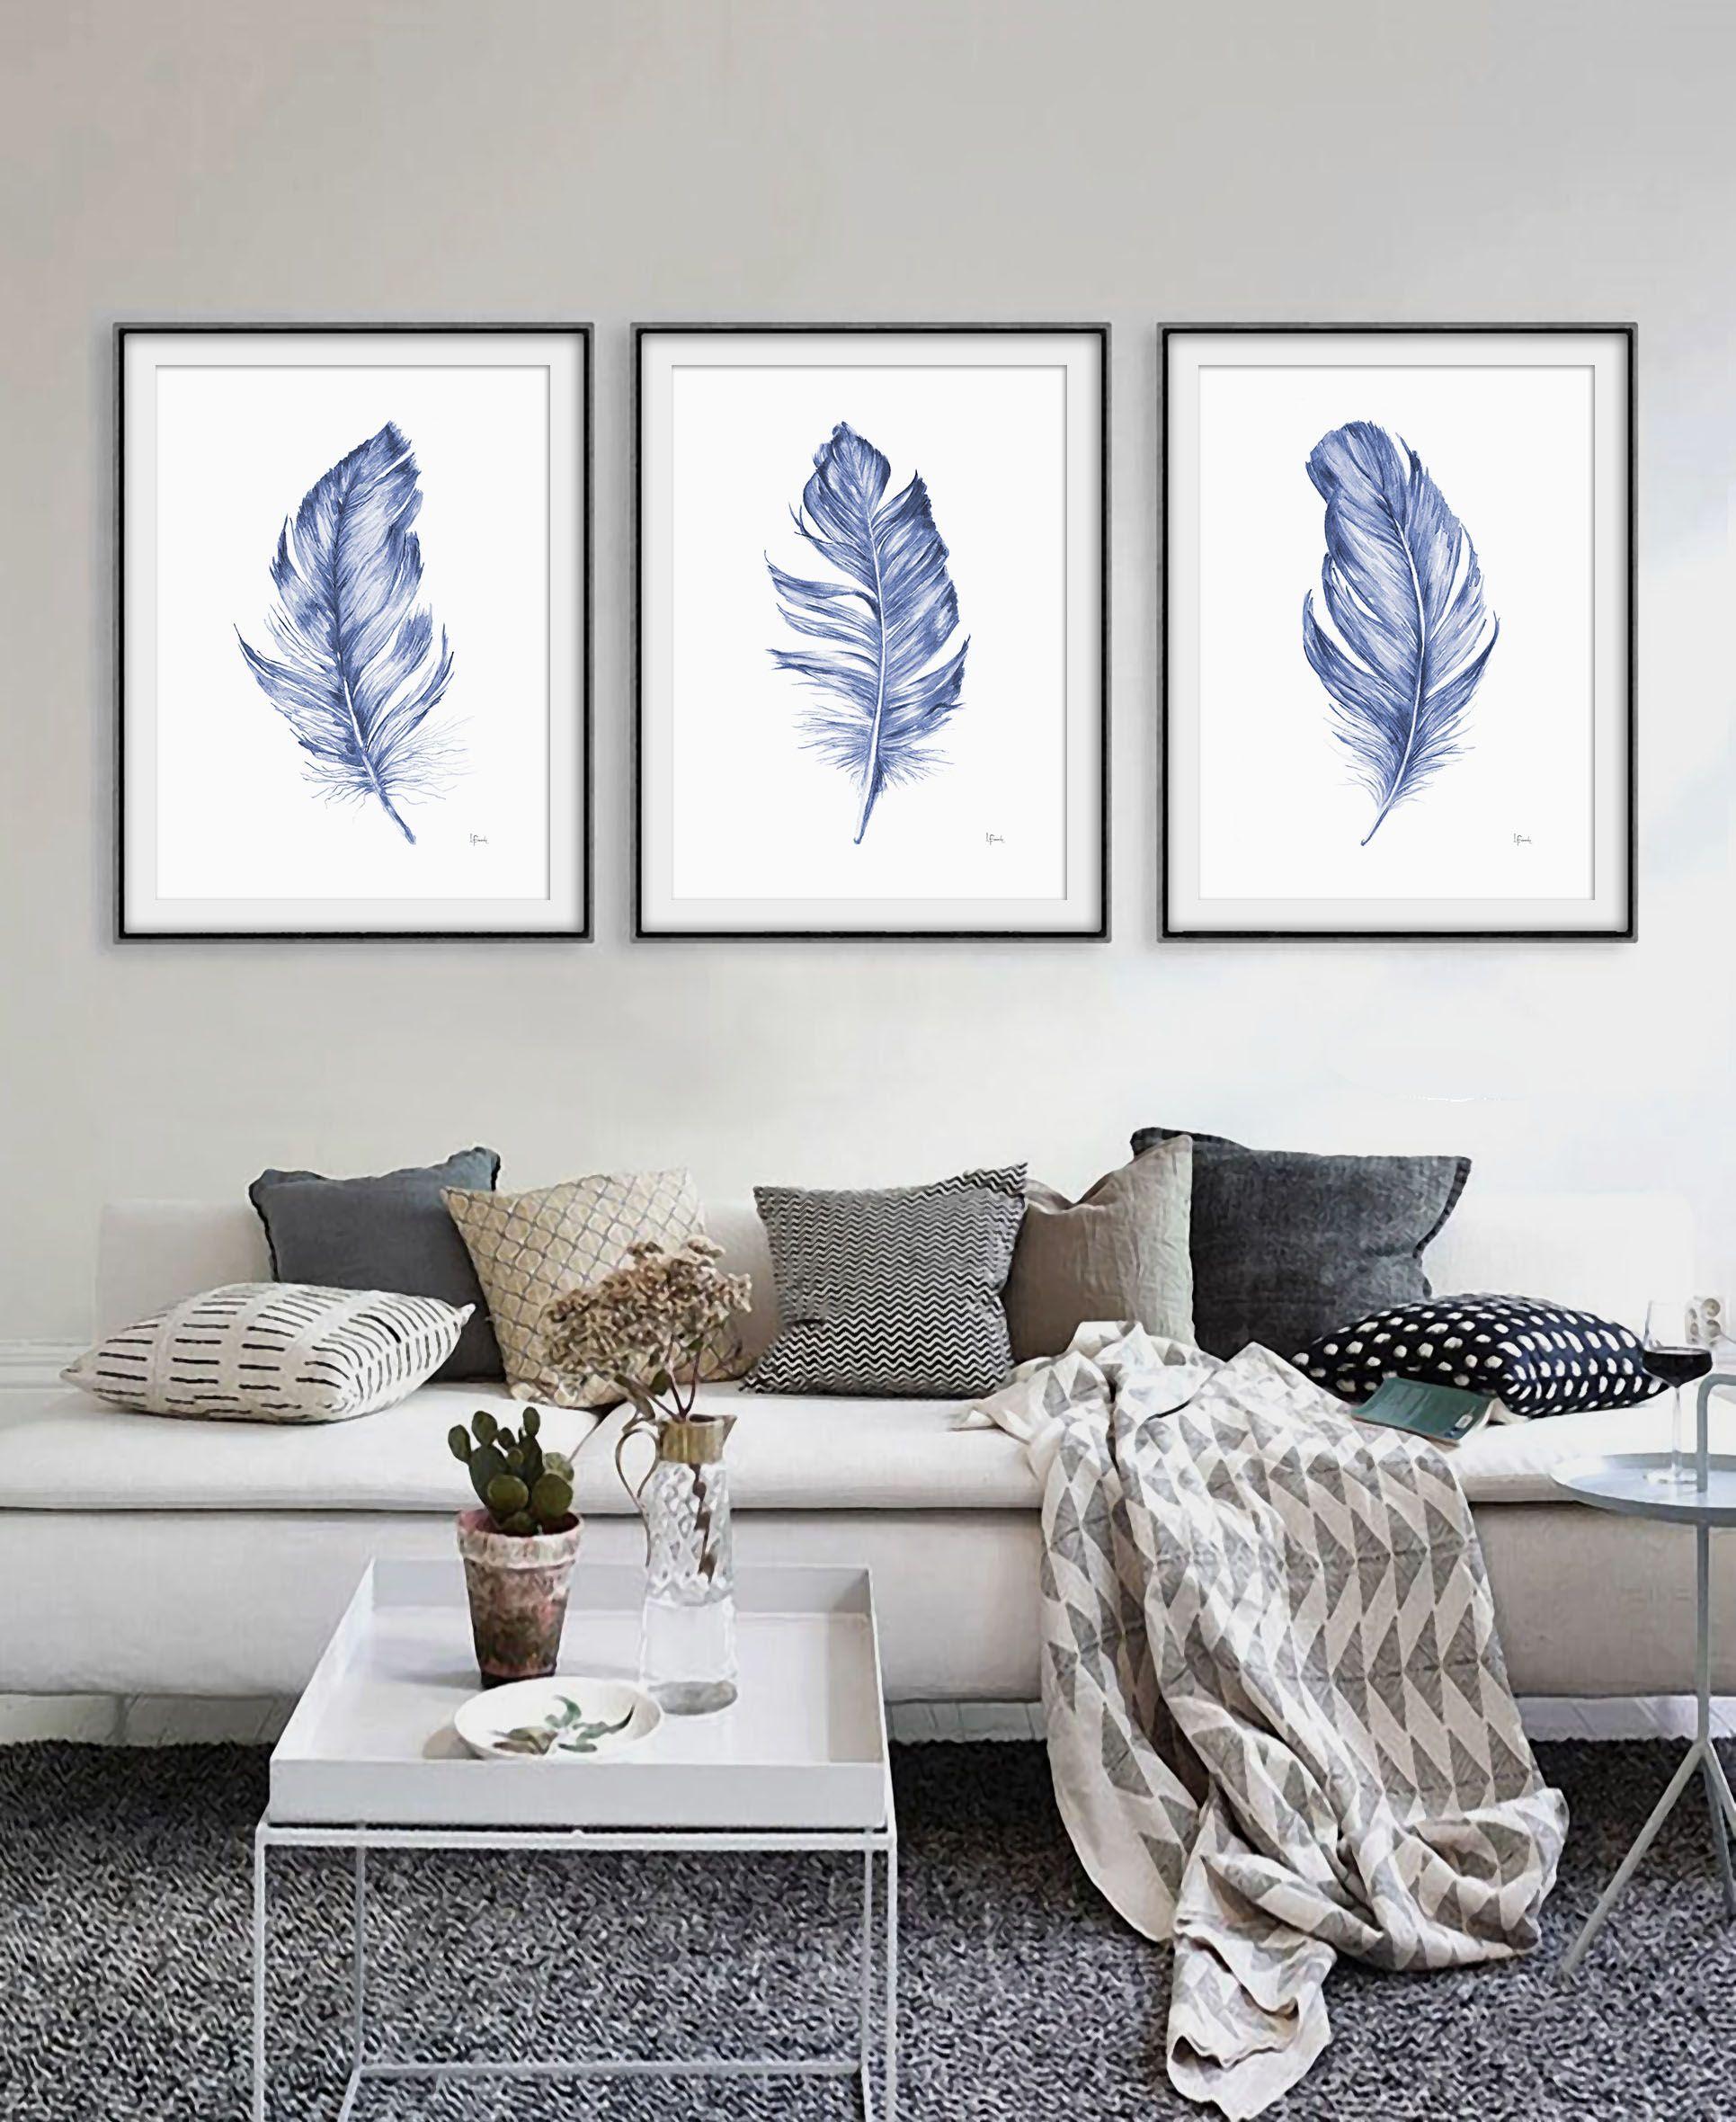 extra large wall art bedroom wall decor living room decor on large wall art id=55144